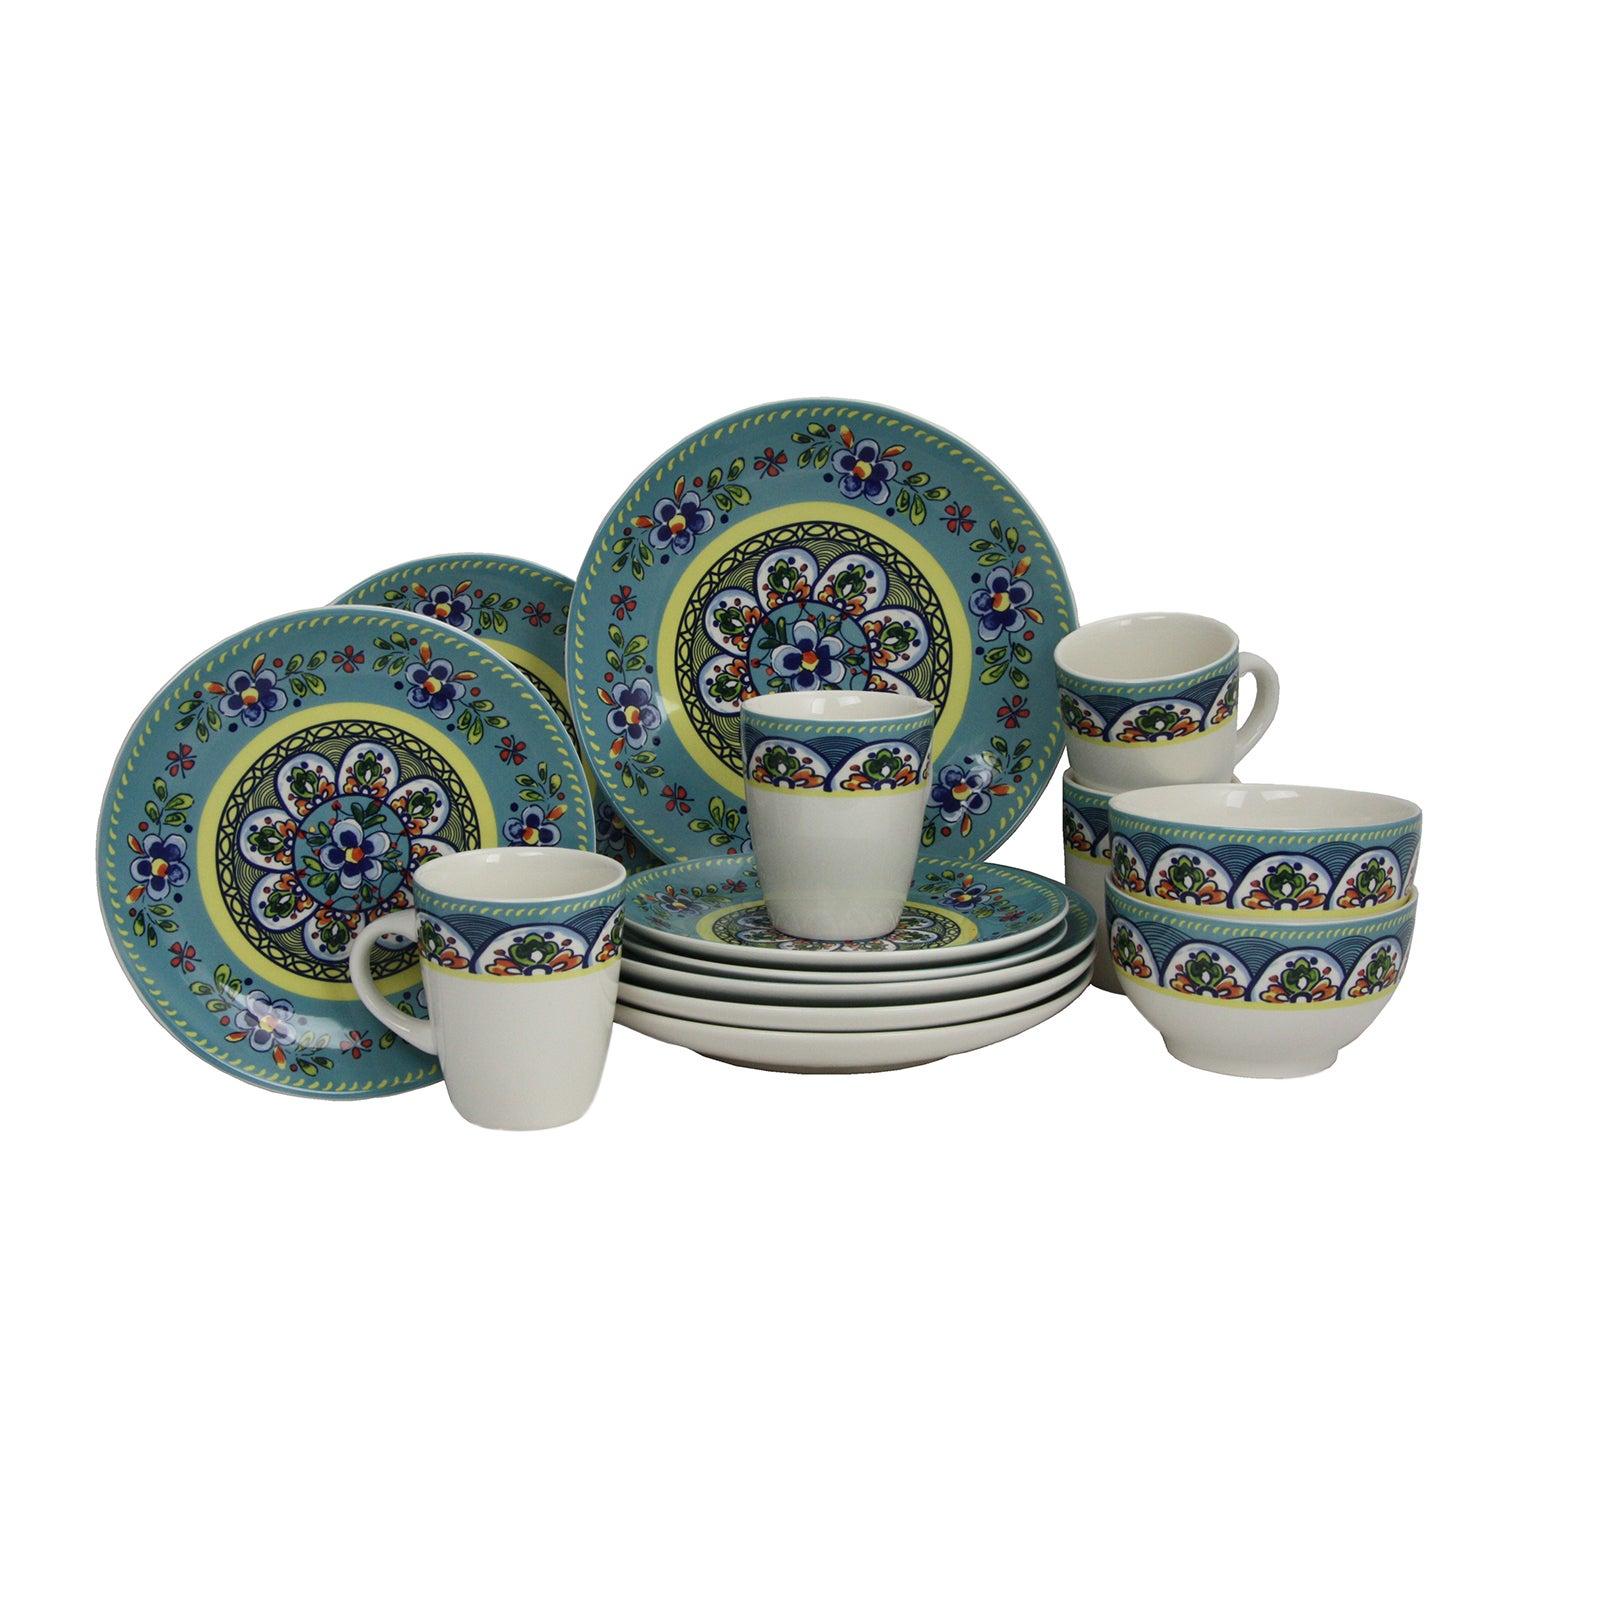 Elama Santa Fe Springs Multicolored Stoneware 16-piece Dinnerware Set - Free Shipping Today - Overstock - 19737094  sc 1 st  Overstock & Elama Santa Fe Springs Multicolored Stoneware 16-piece Dinnerware ...